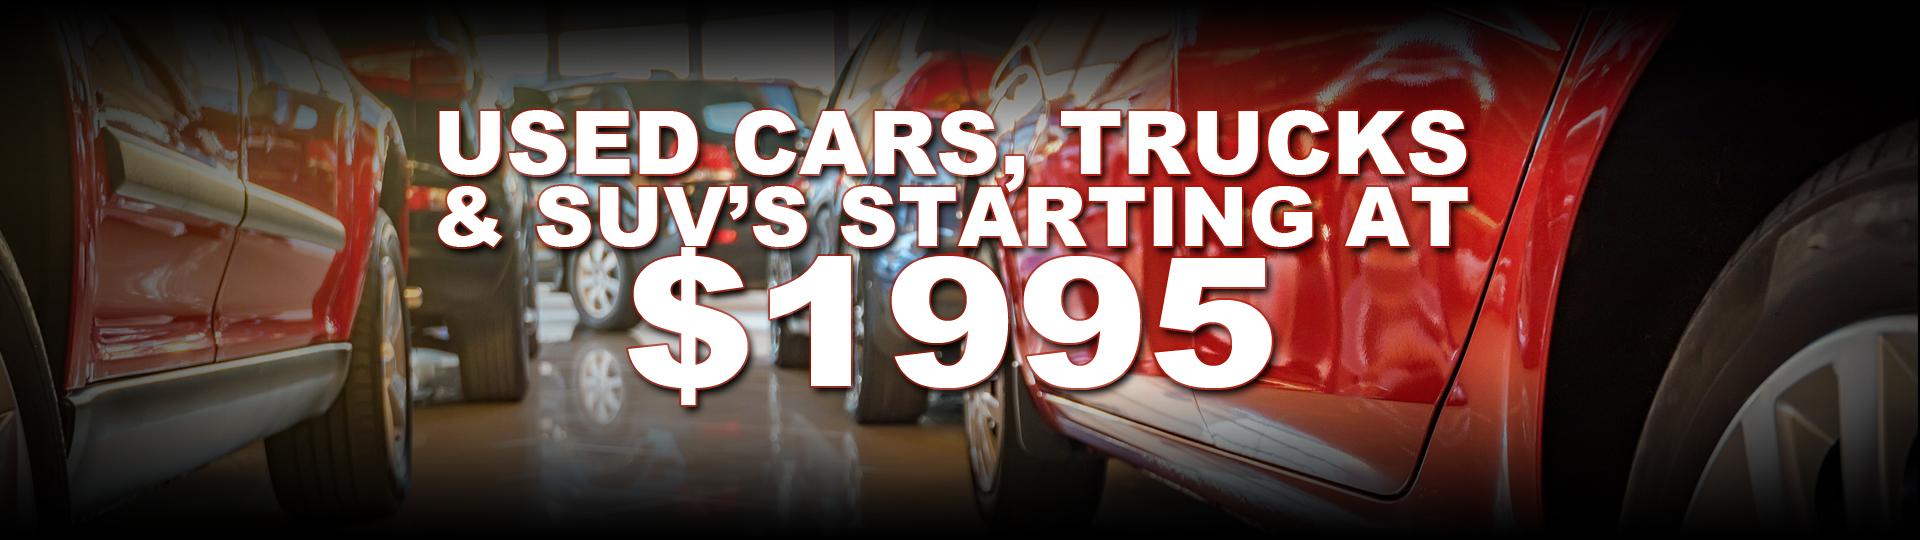 https://x-assets.autorevo-powersites.com/content/assets/clients/2215de71-f467-425e-b70e-351248ec9e4f/1-showroom-of-cars